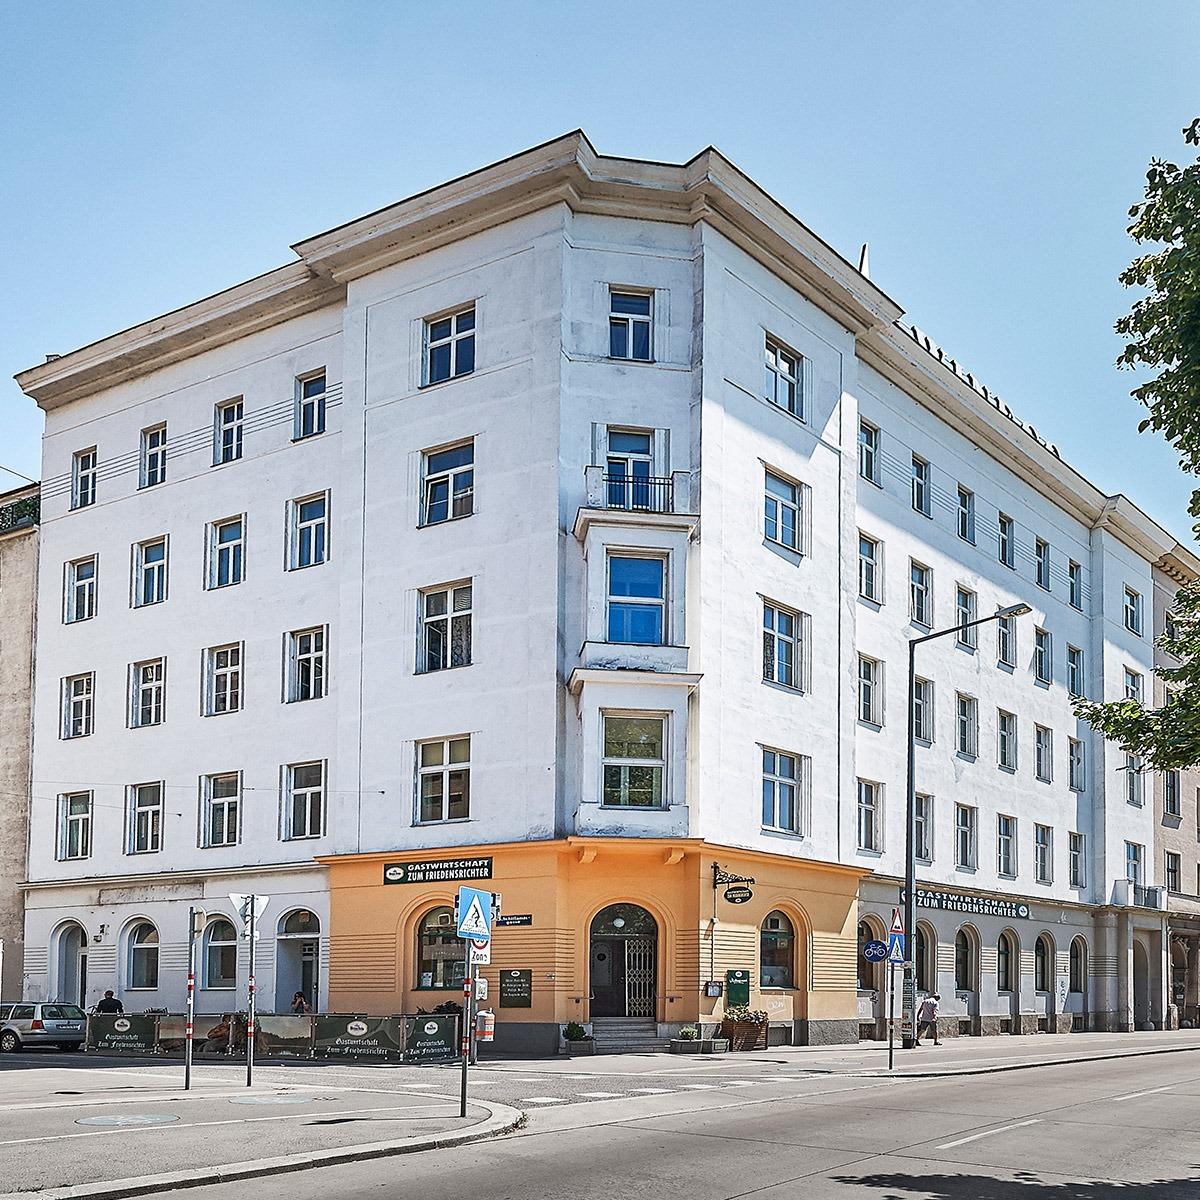 2018 1020 Obere Donaustraße